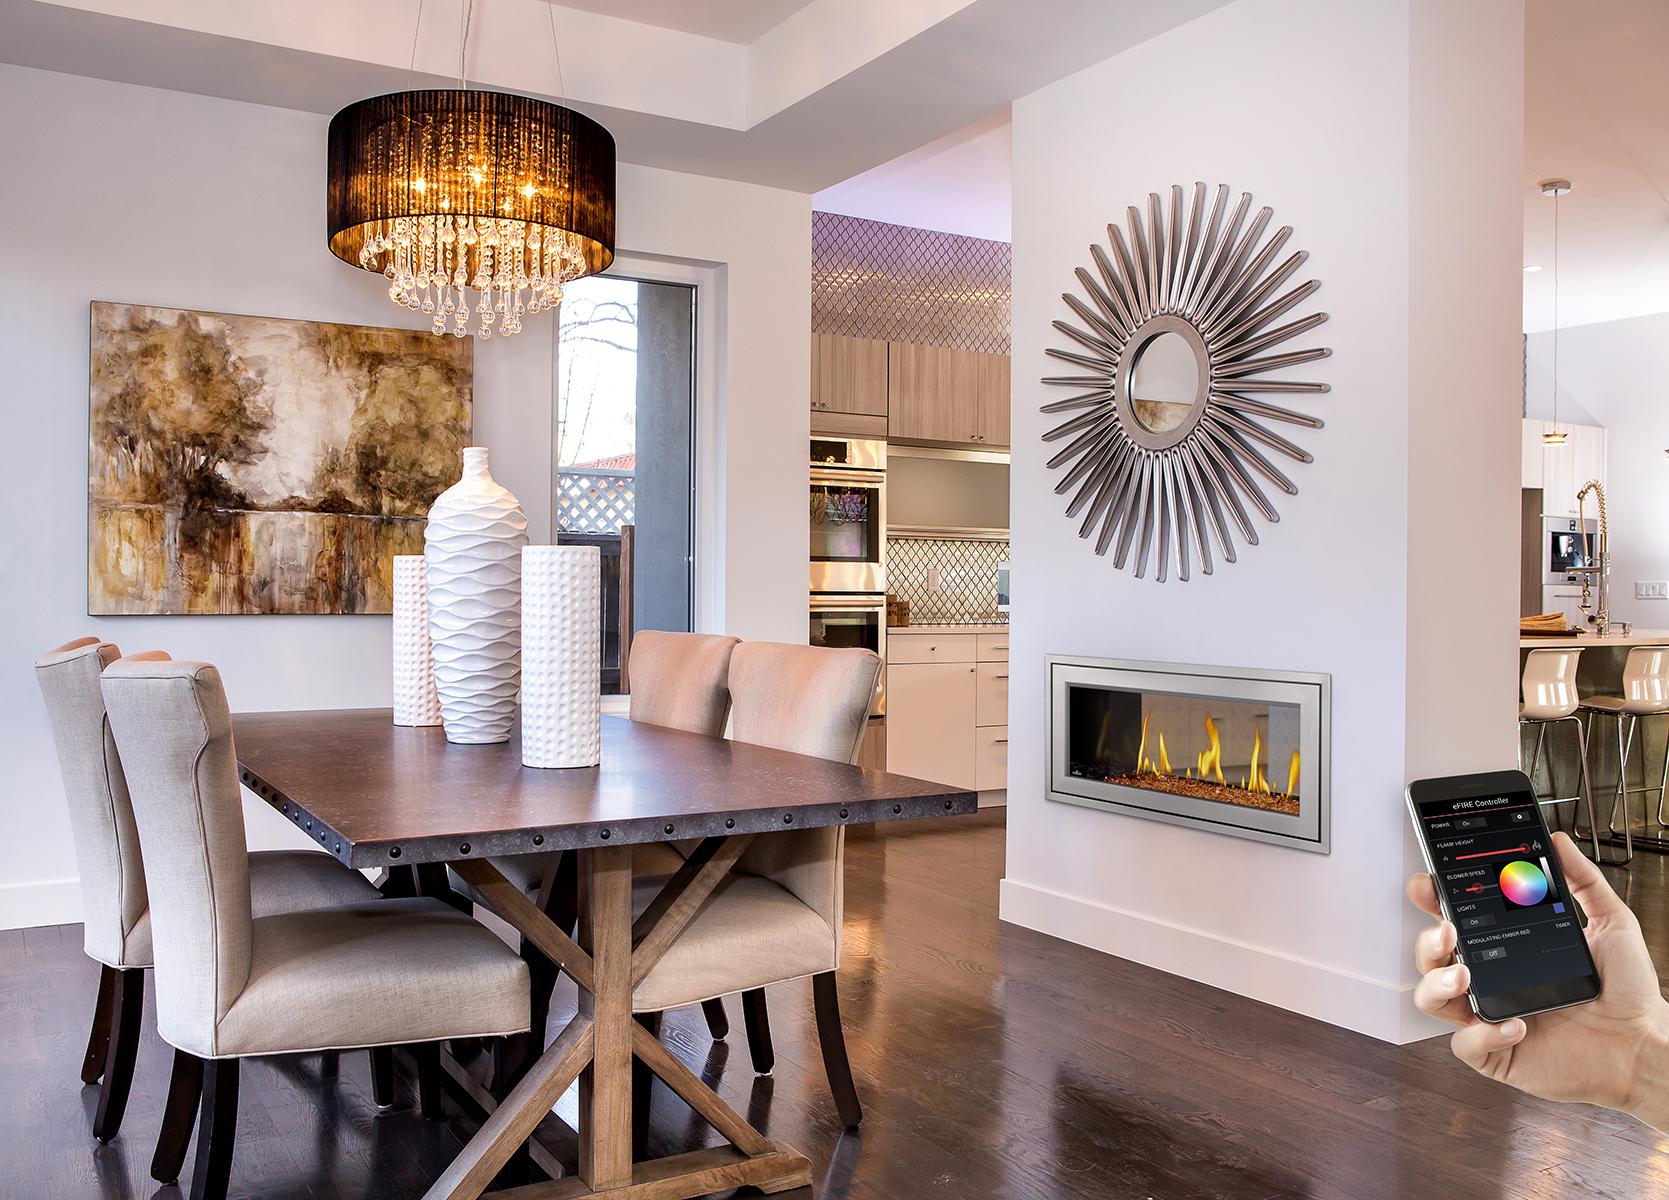 vector-lv38-livingroom-st-angle-efire-hand-napoleon-fireplaces.jpg